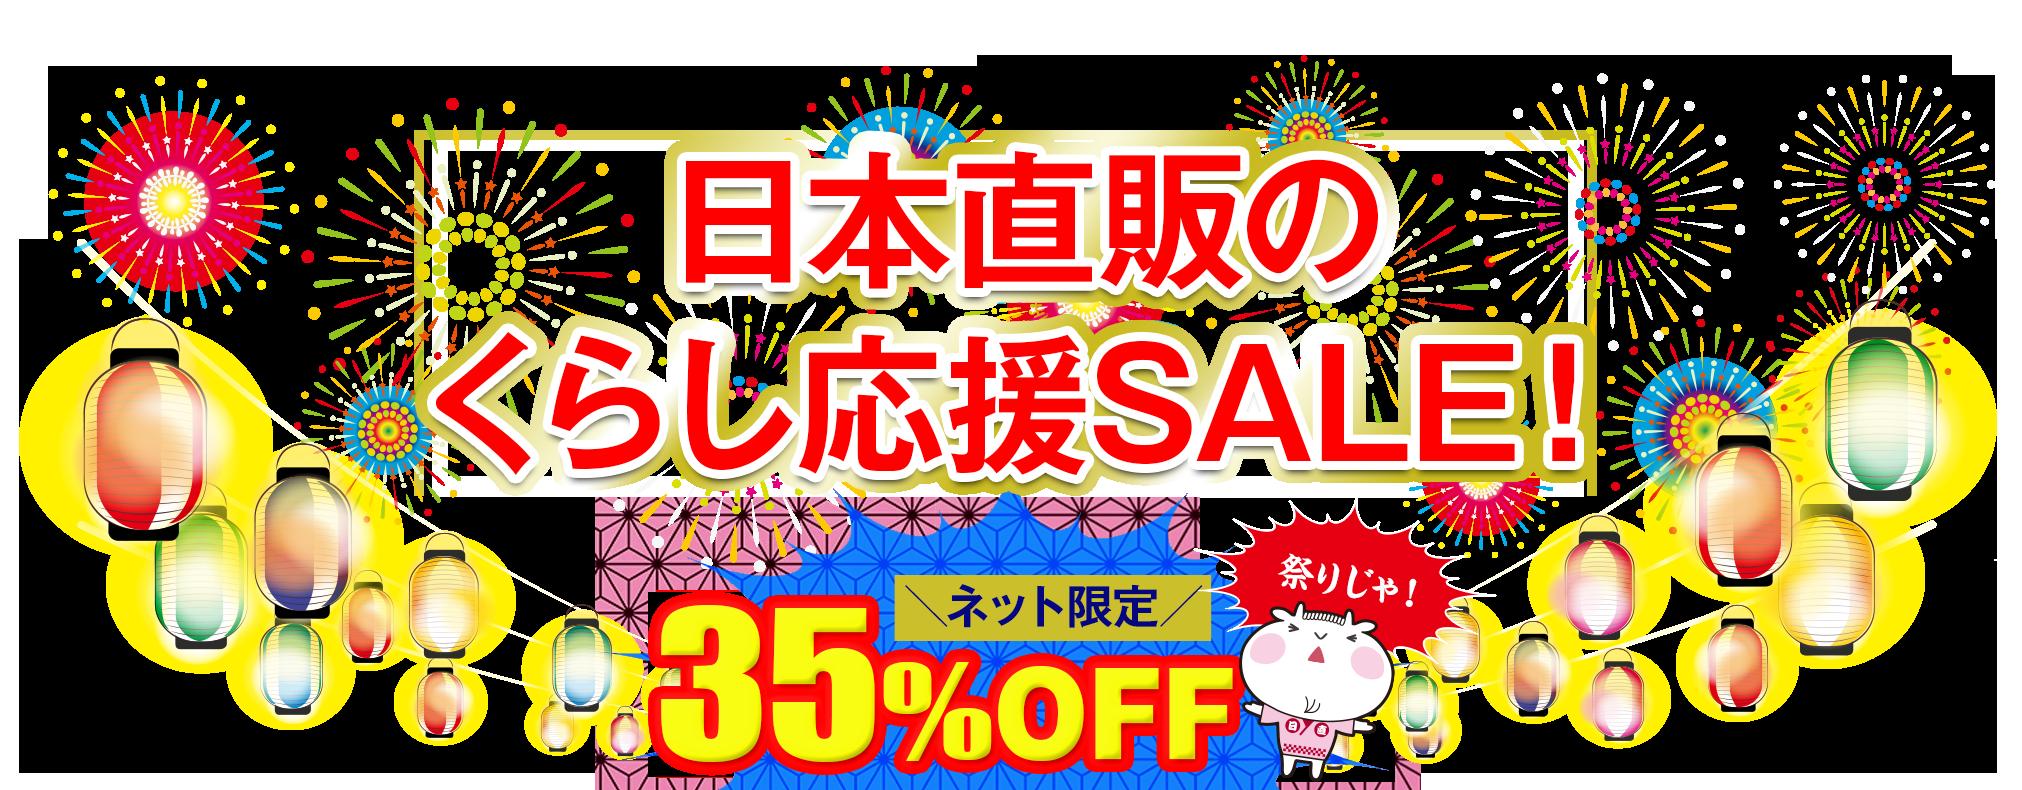 WEB限定!送料無料 売切れ御免 日本直販セール